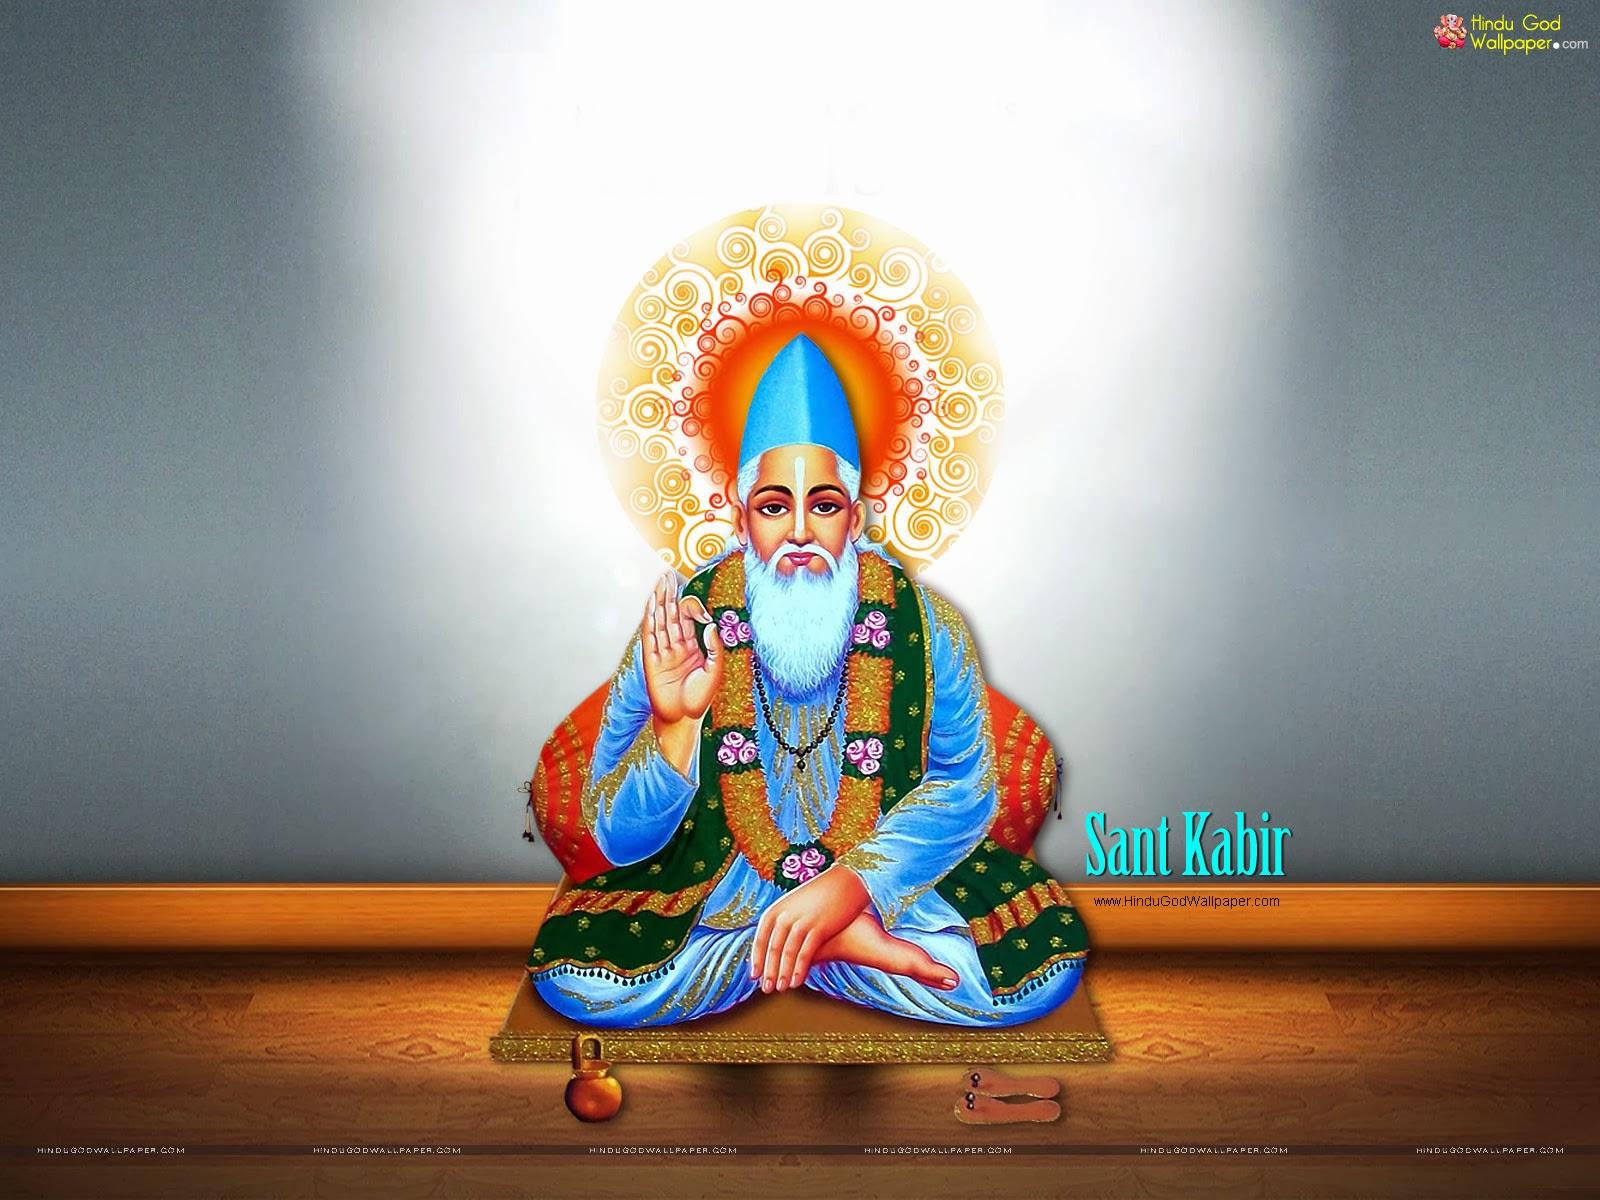 Sai Baba Hd 3d Wallpaper Download Kabir Das Hindu God Wallpapers Download